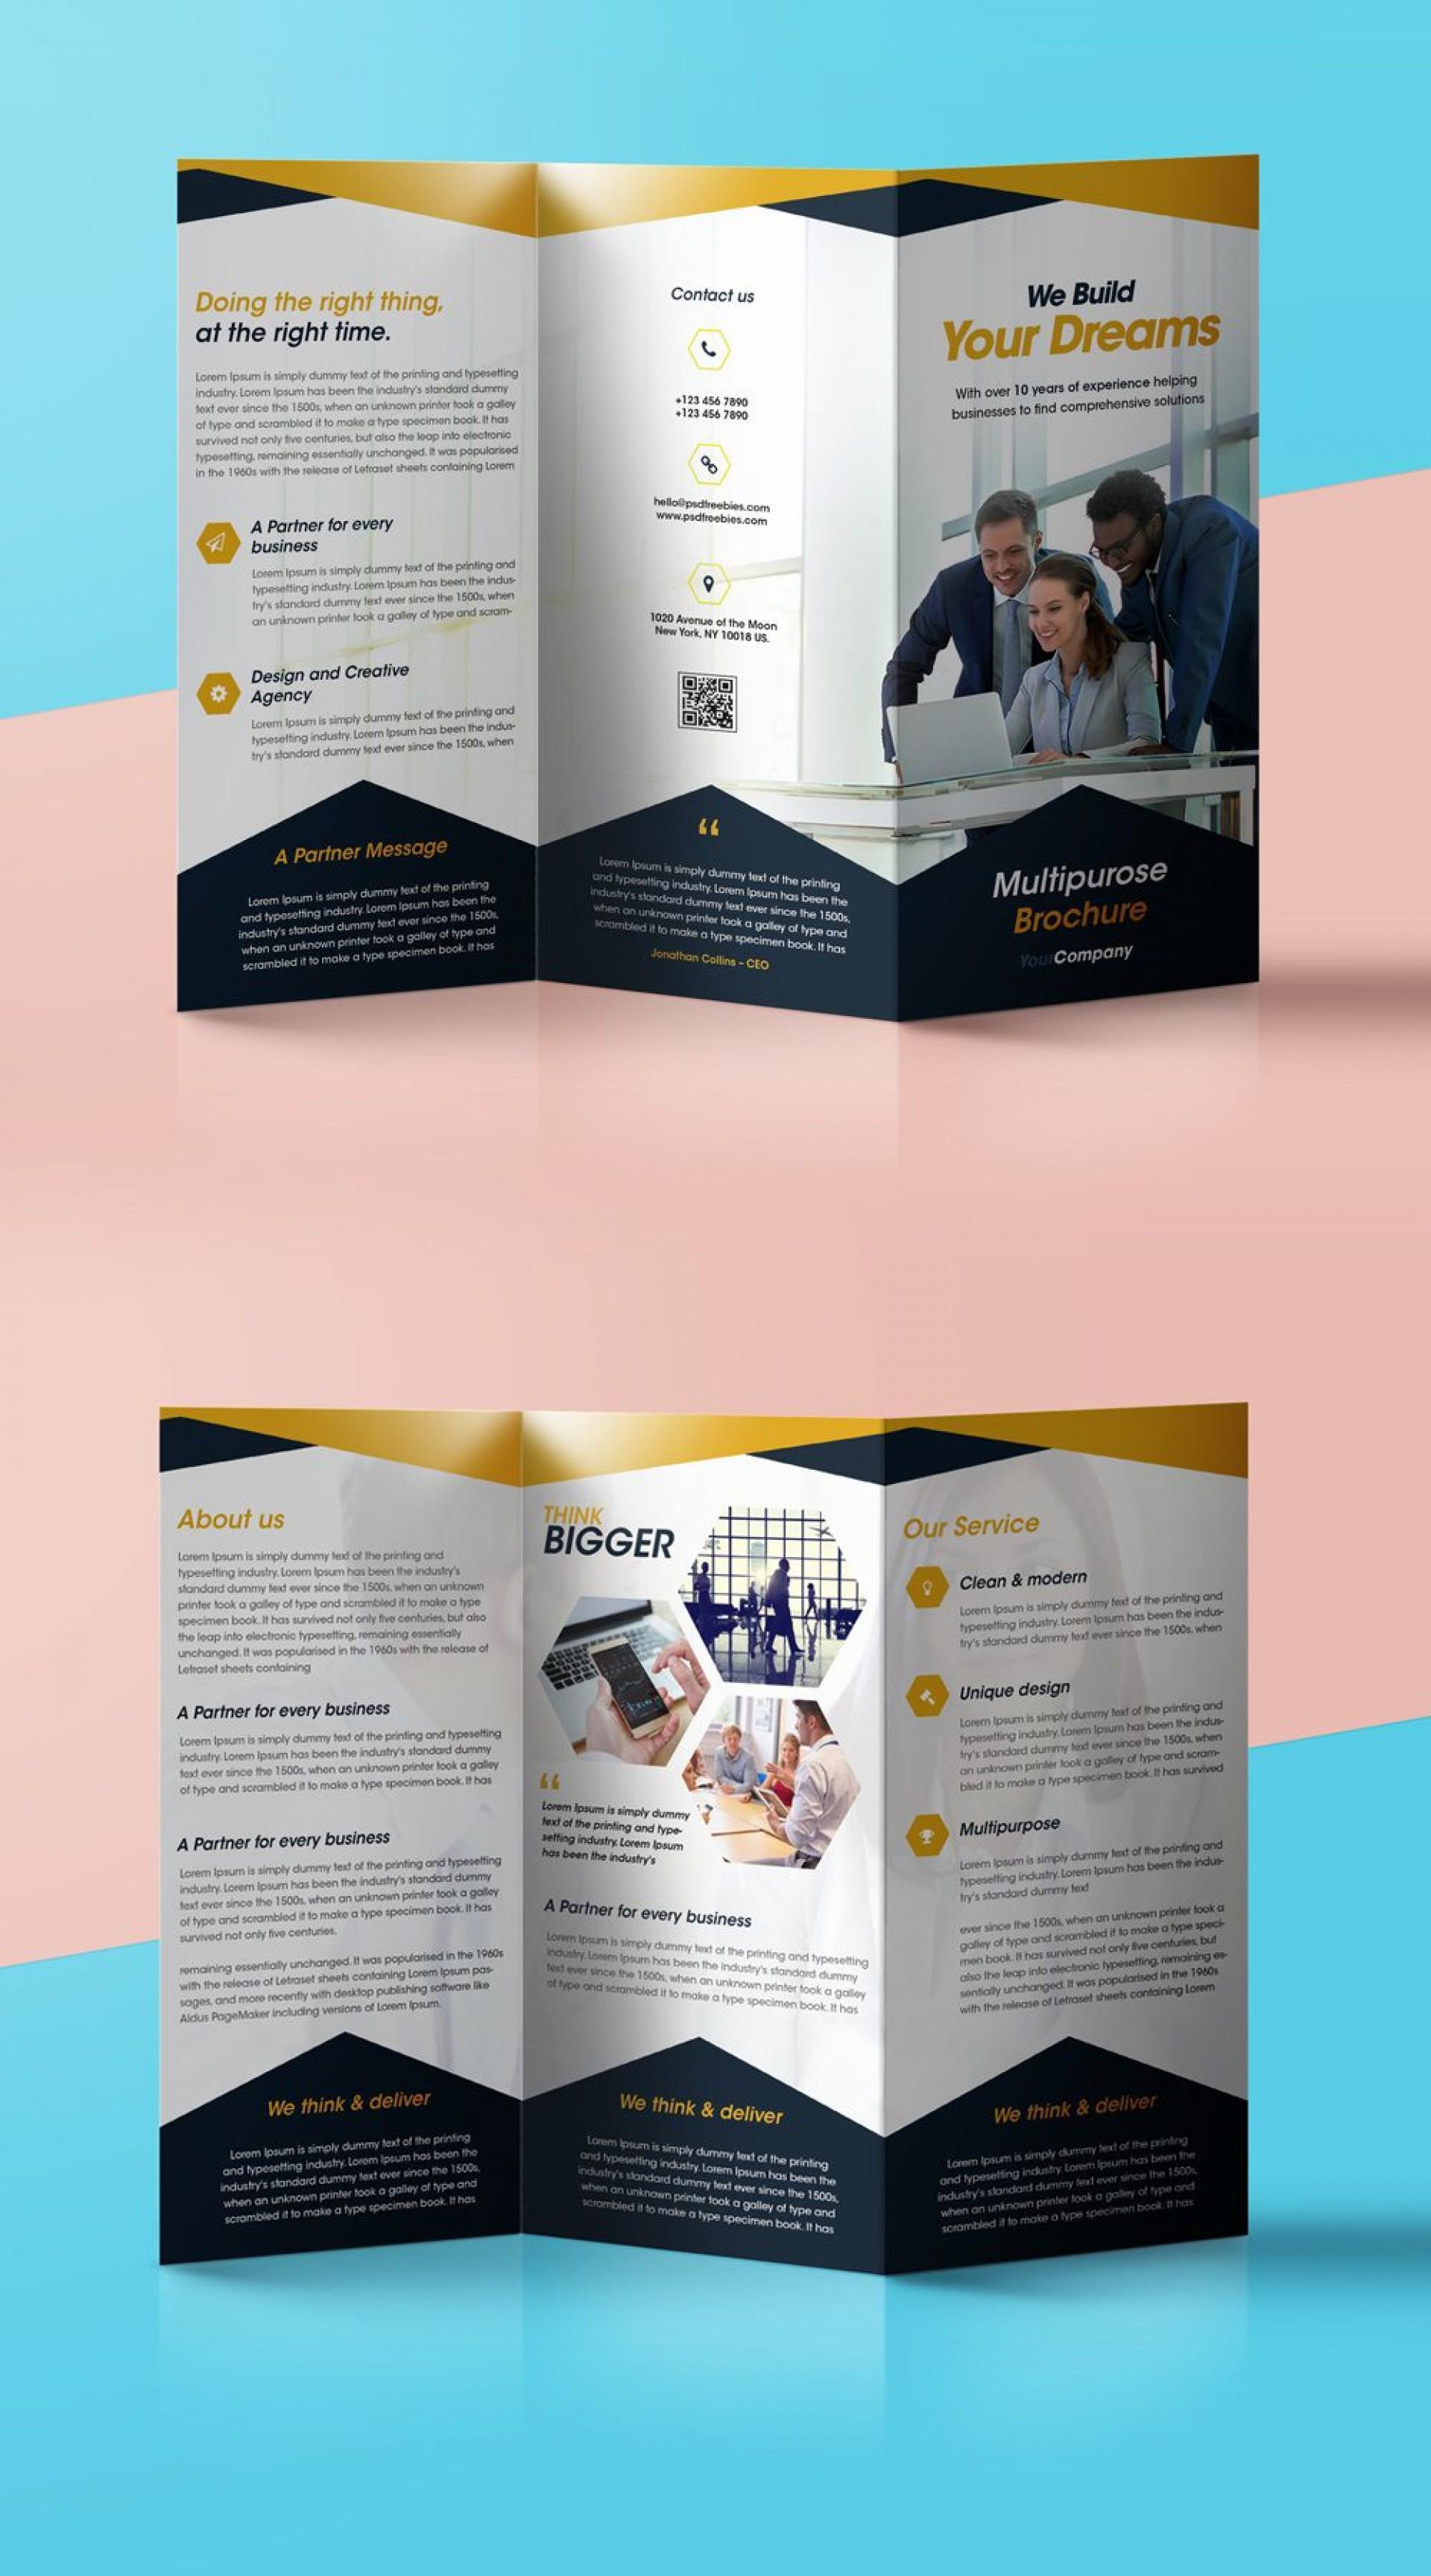 008 Fearsome Free Tri Fold Brochure Template Photo  Photoshop Illustrator Microsoft Word 20101920